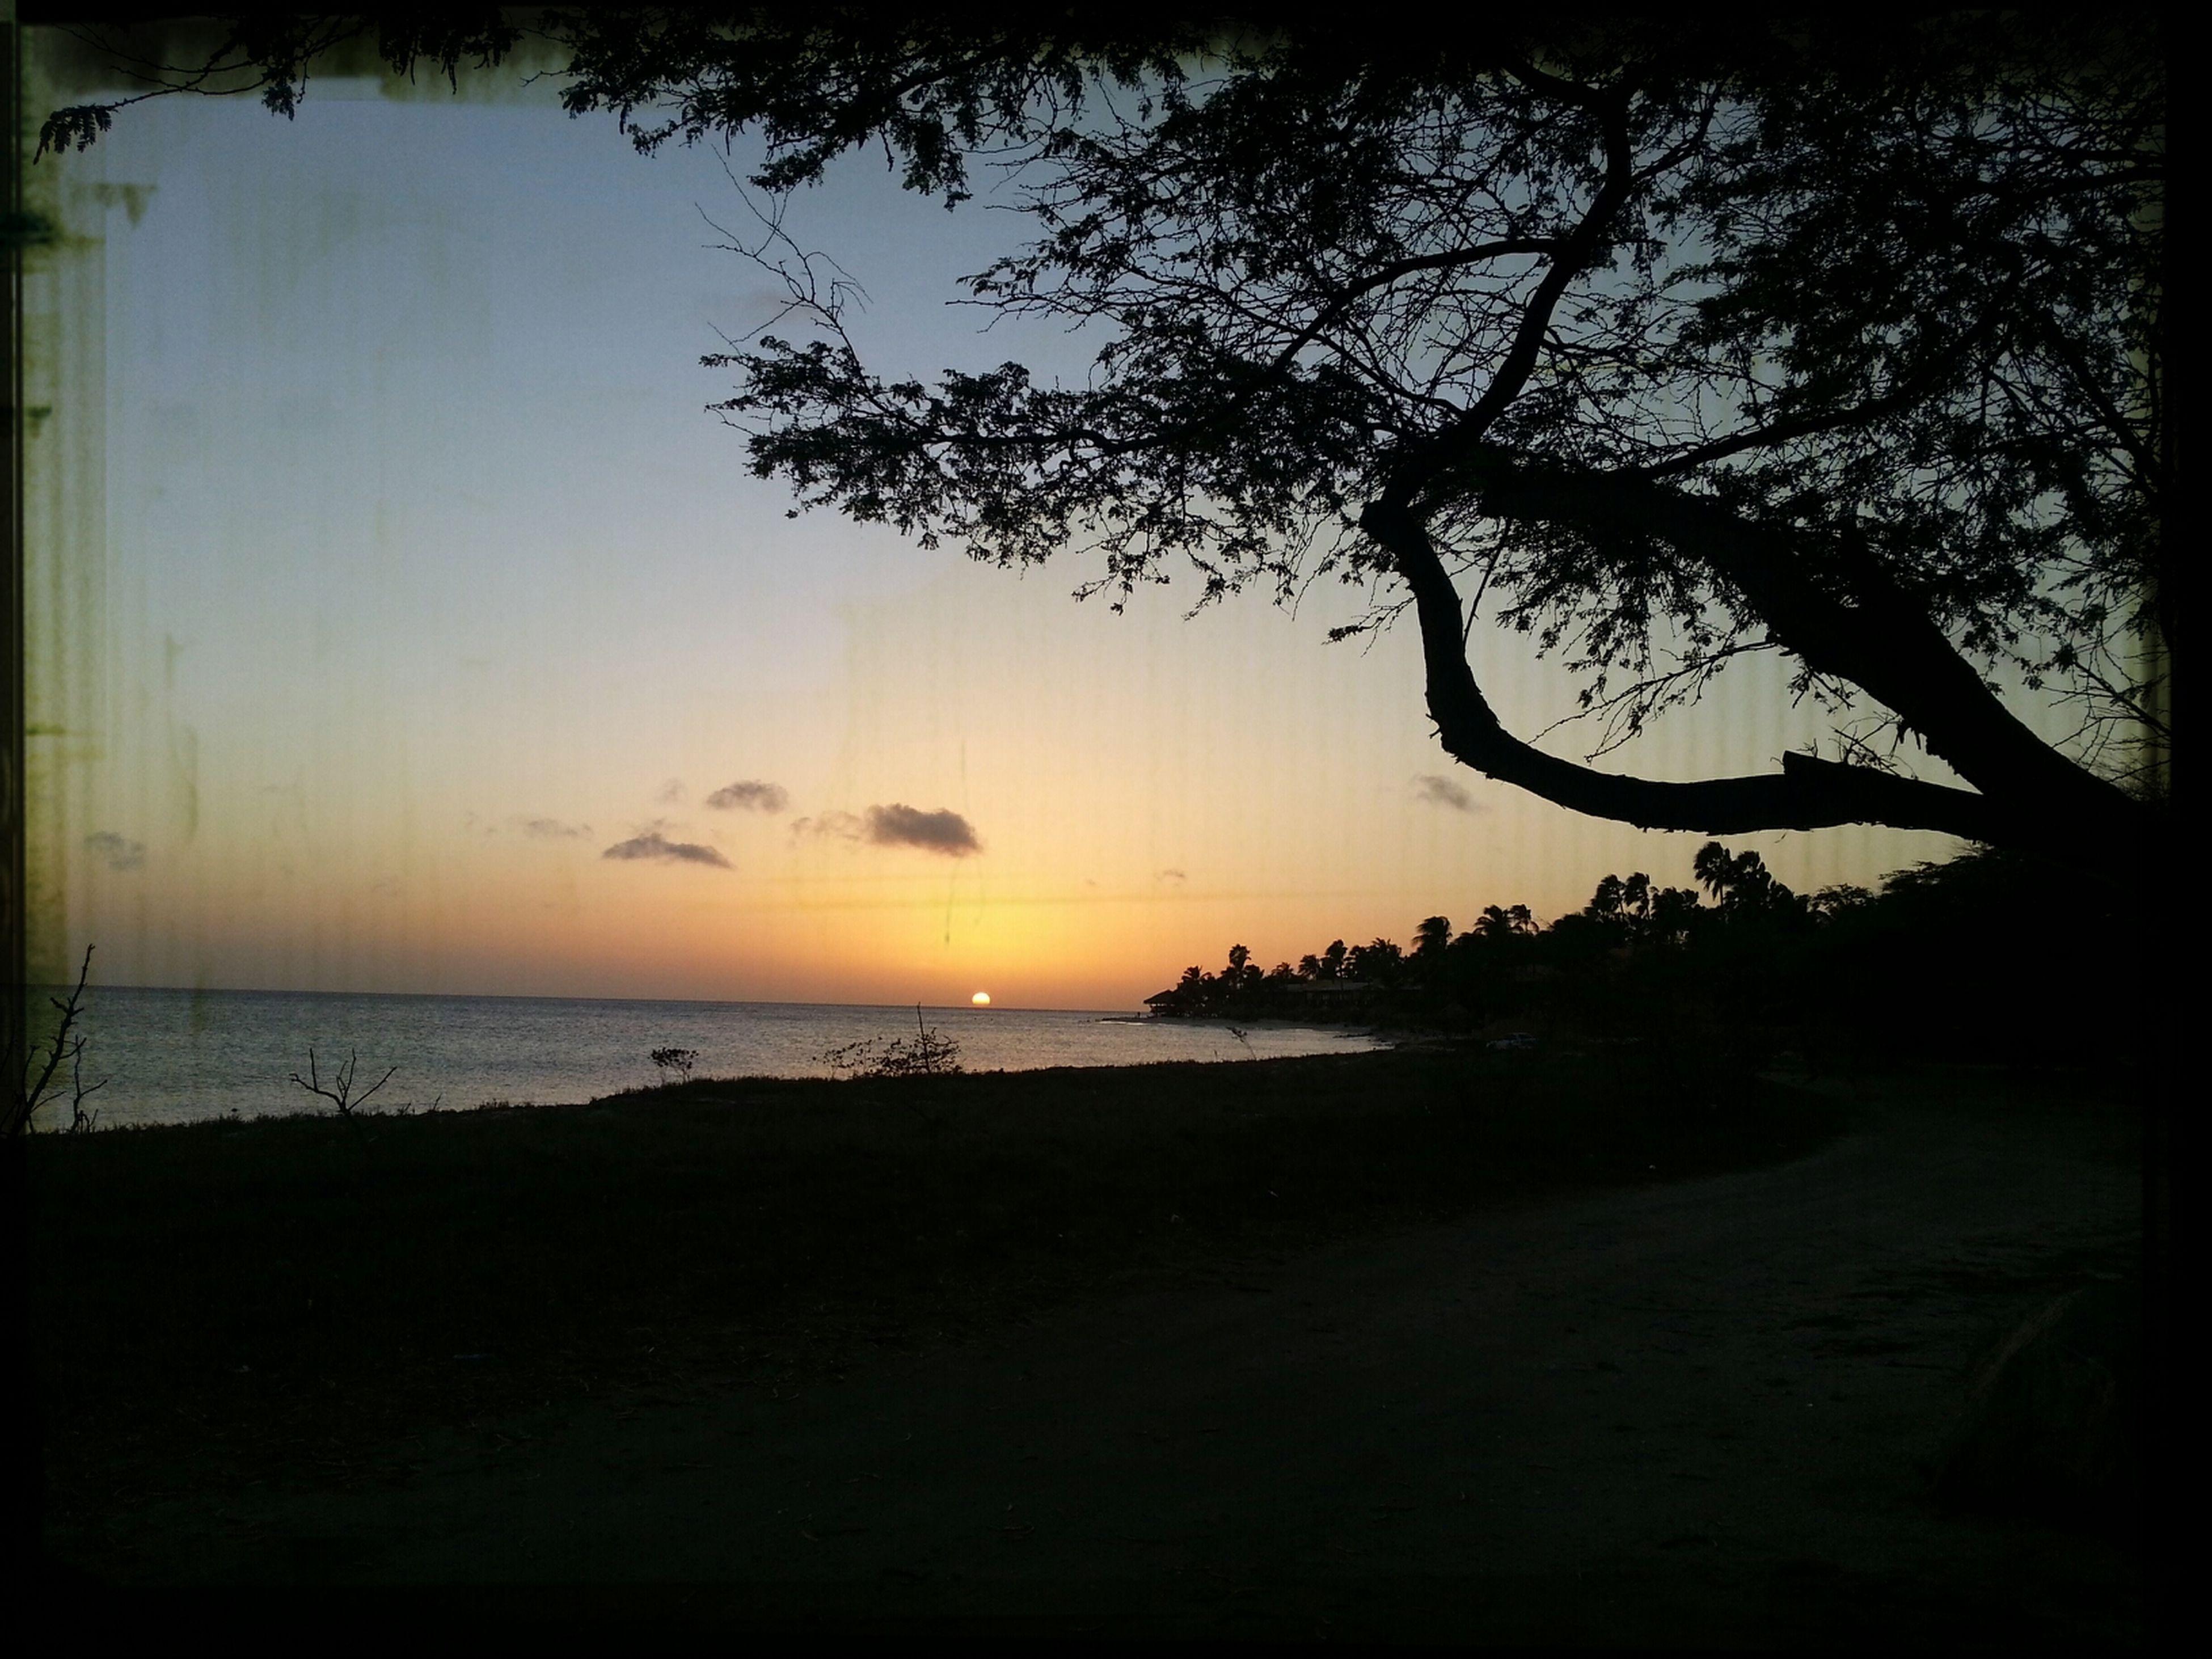 Atardecer en la isla feliz...